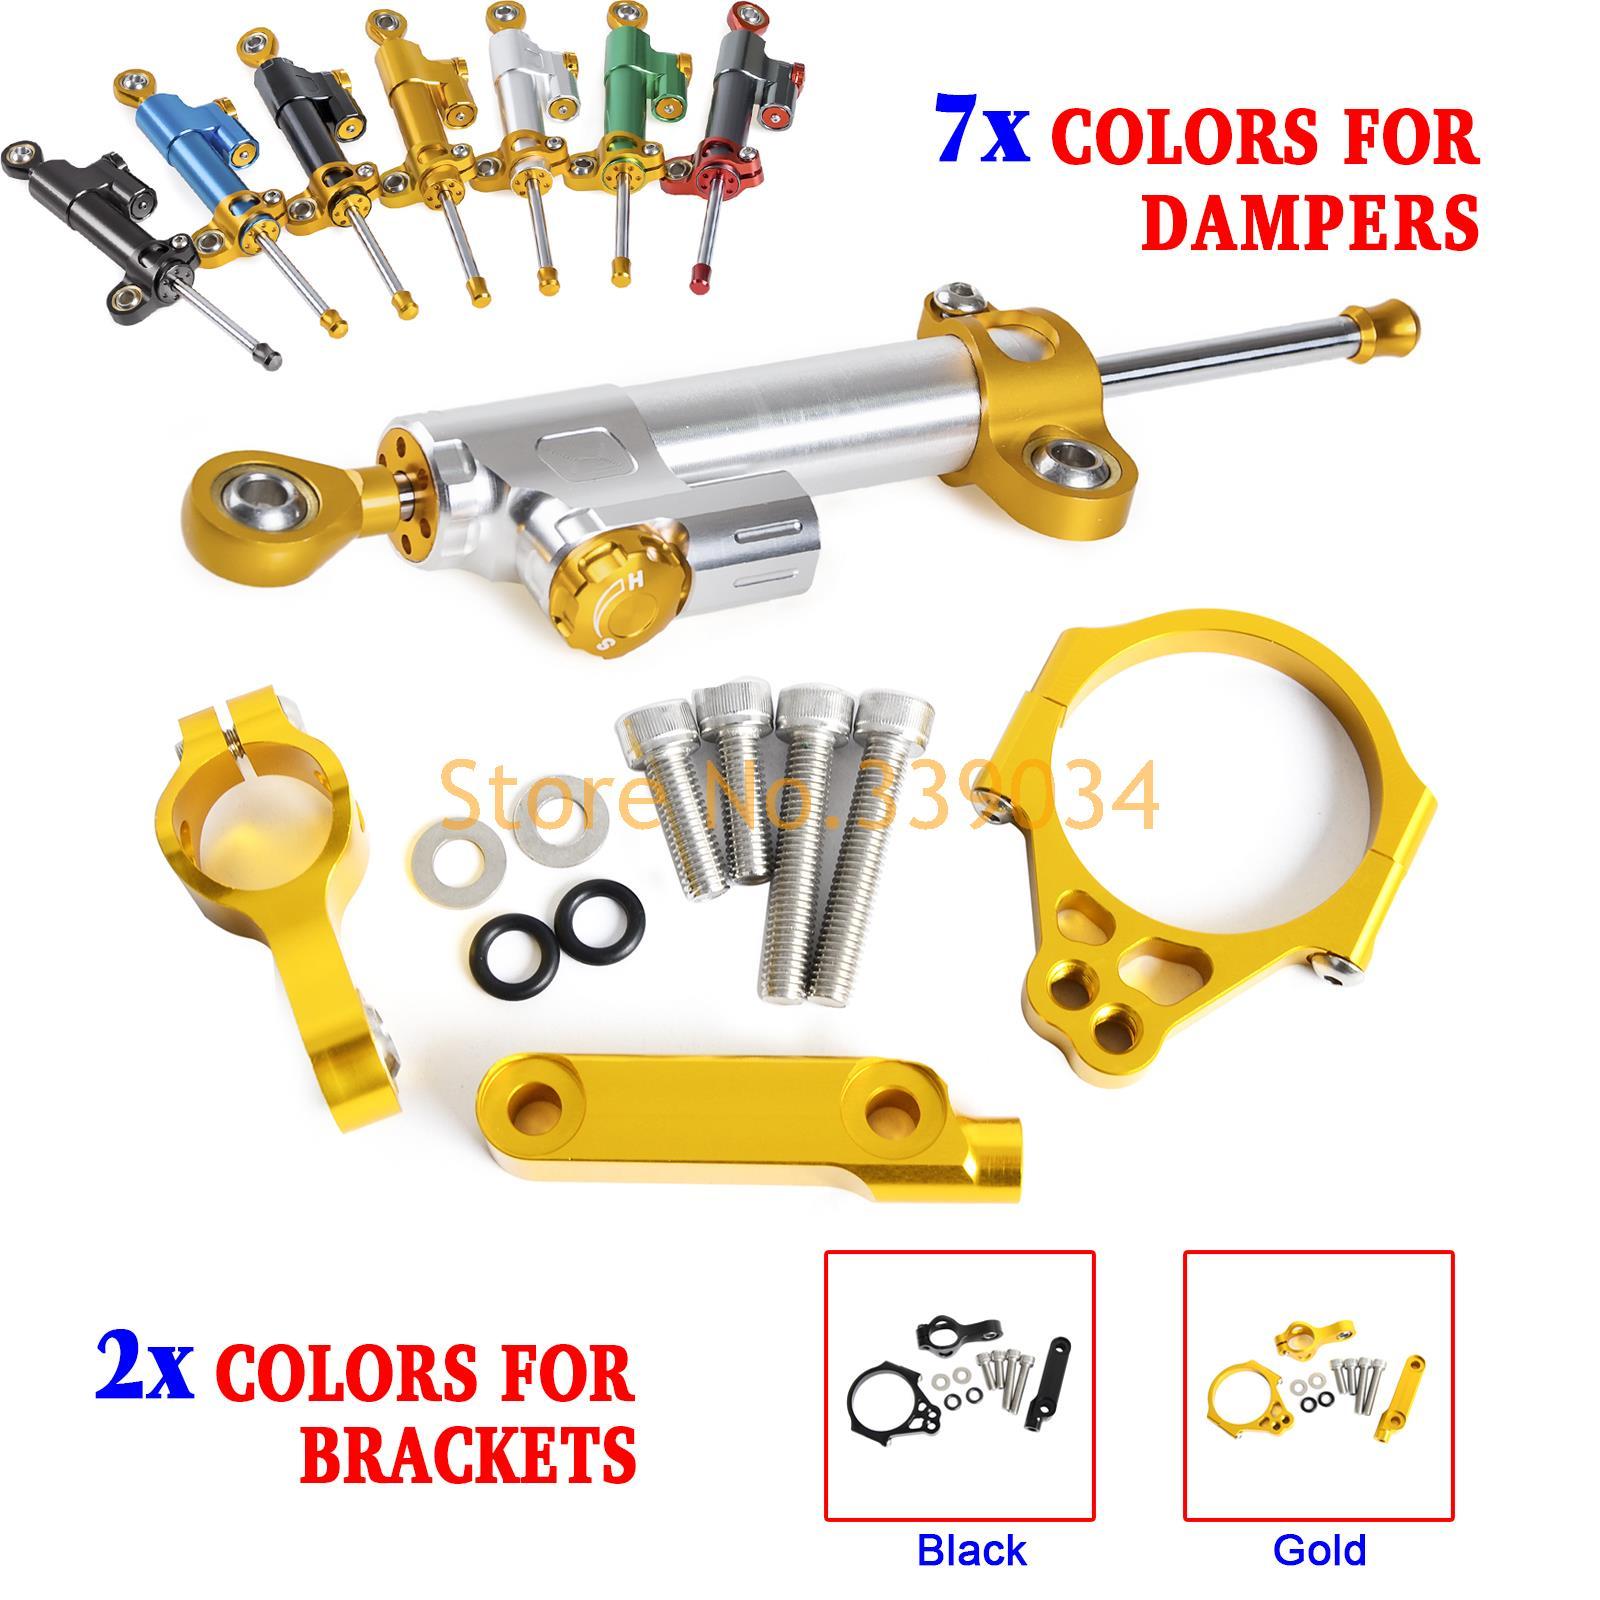 Motorcycle CNC Steering Damper Stabilizer & Bracket For Kawasaki  VERESYS 1000  2012 2013 2014 2015 2016 motorcycle cnc steering damper with bracket suport for kawasaki z800 2013 2014